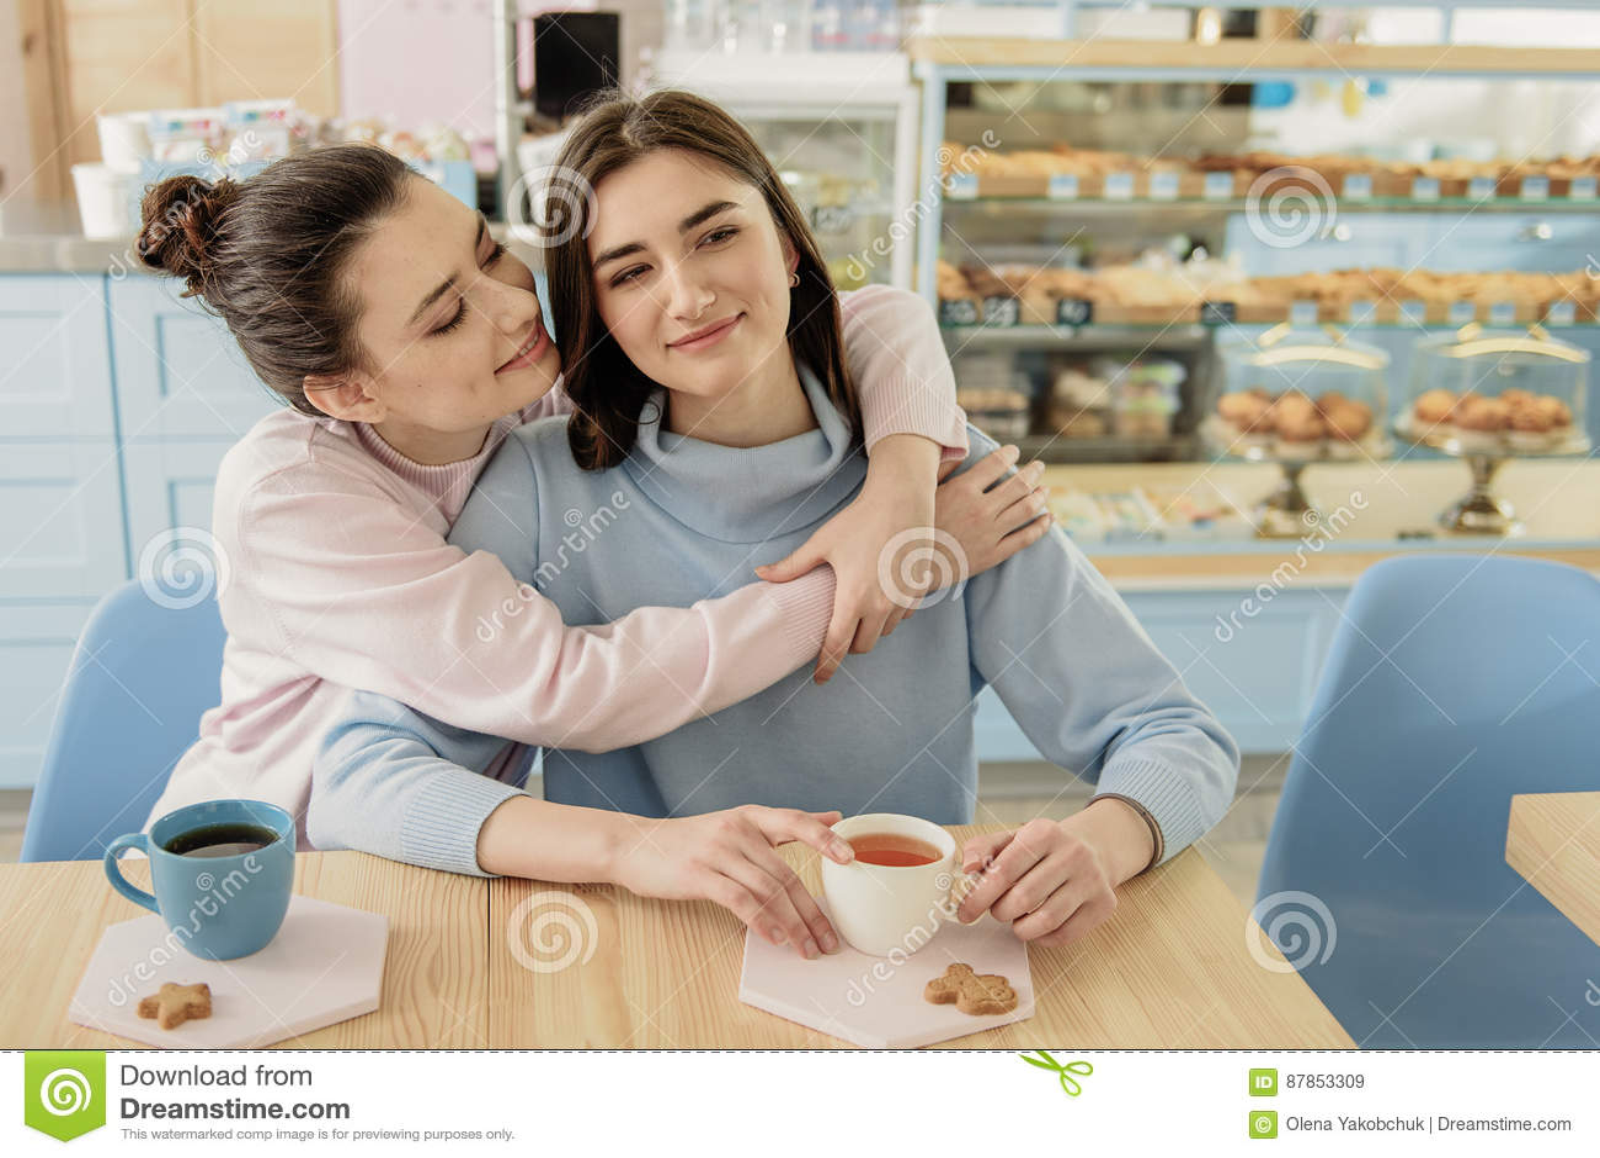 Erotic lesbian couples